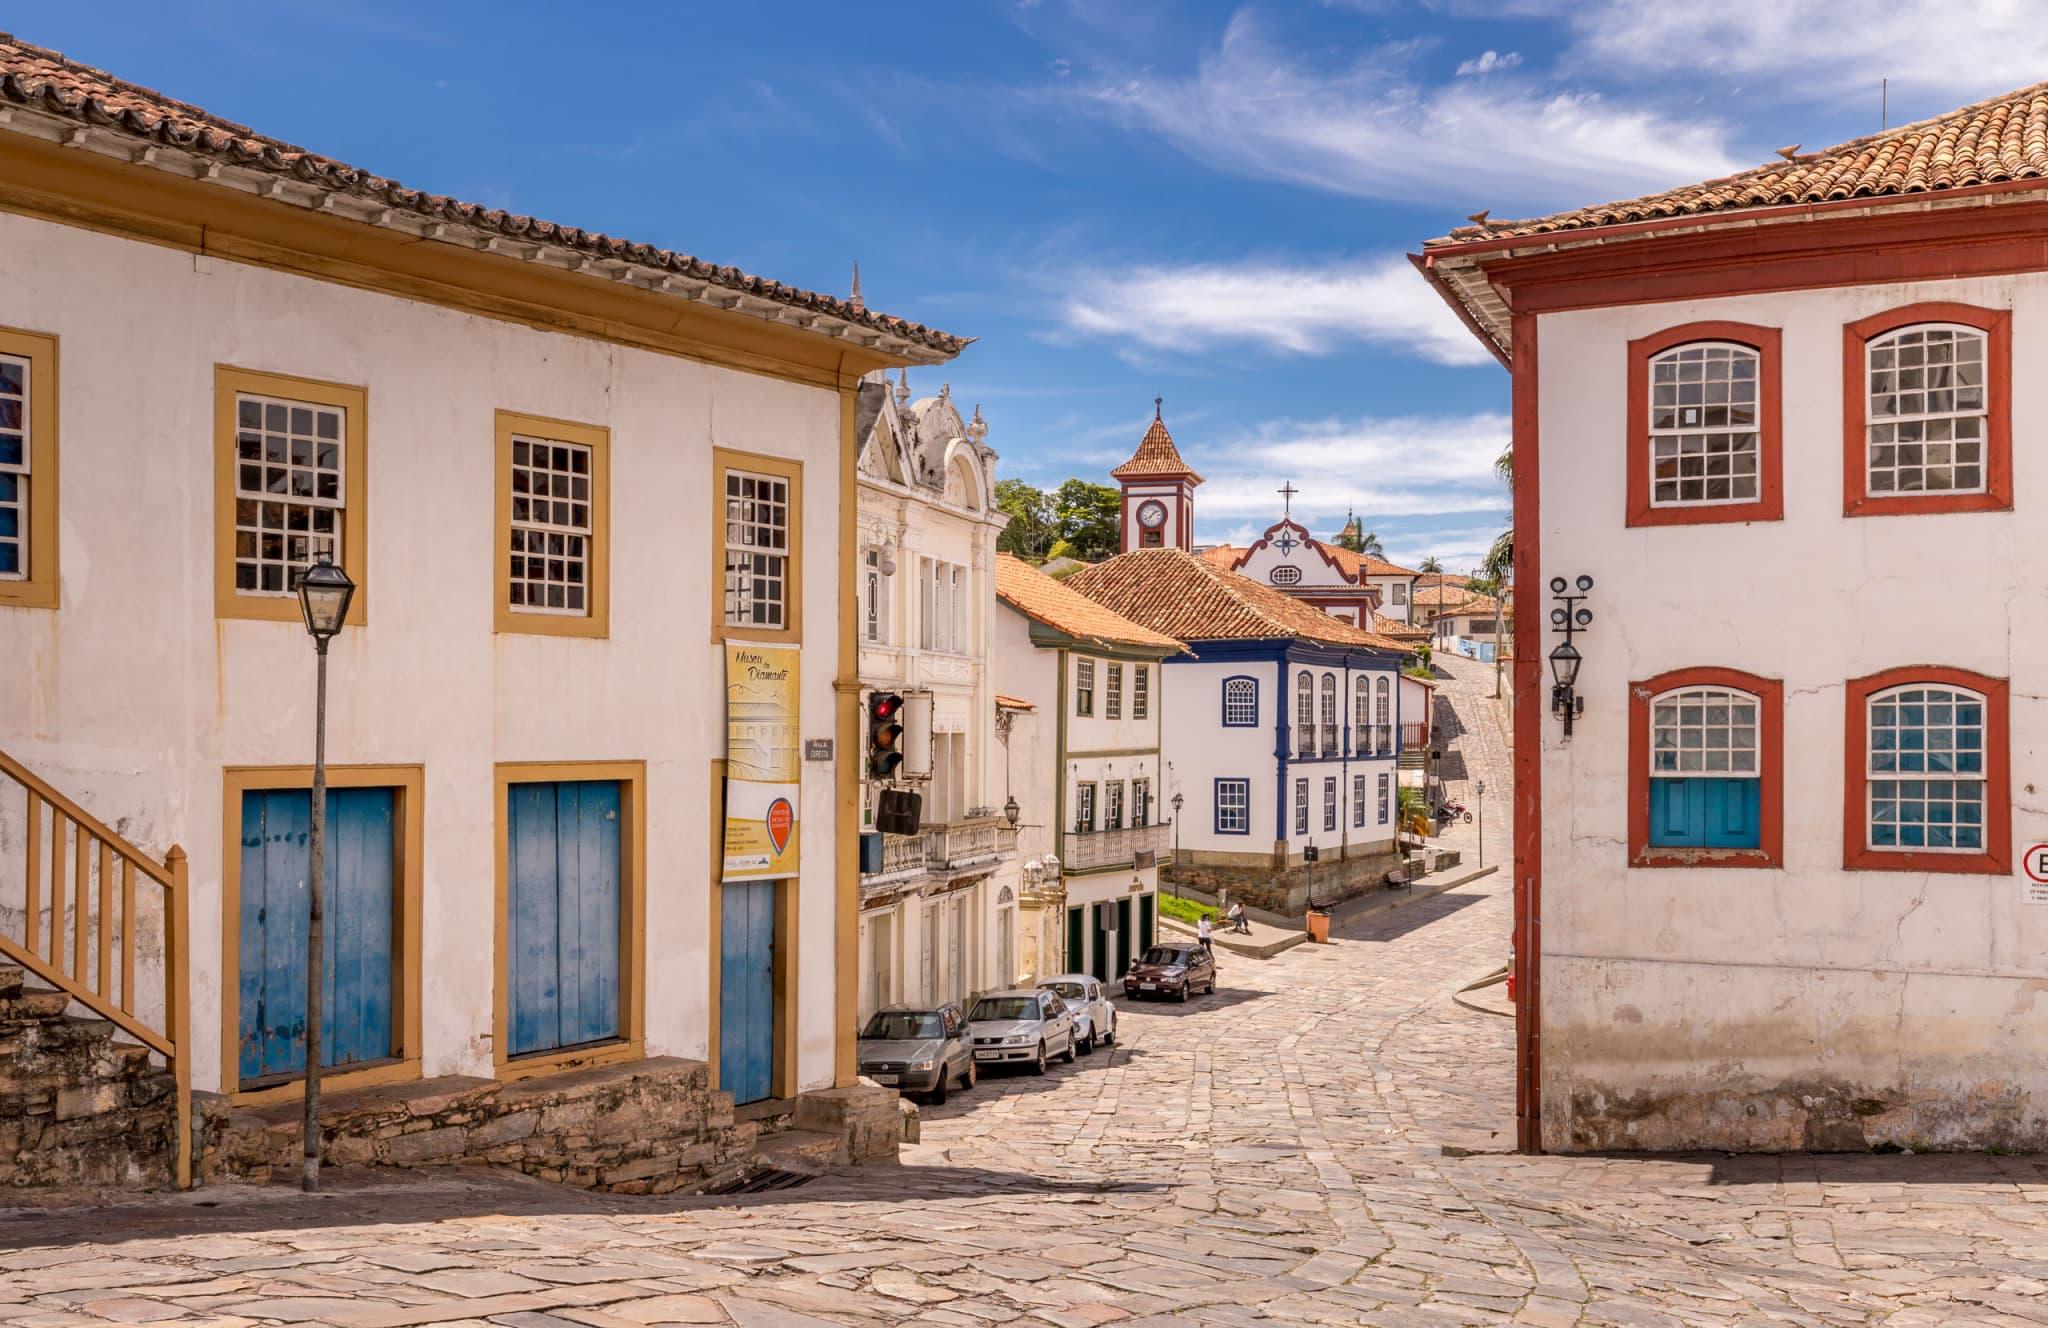 Diamantina Cobble Stone Street - BRAZIL - A 5-day Minas Gerais itinerary: Belo Horizonte, Ouro Preto & Diamantina